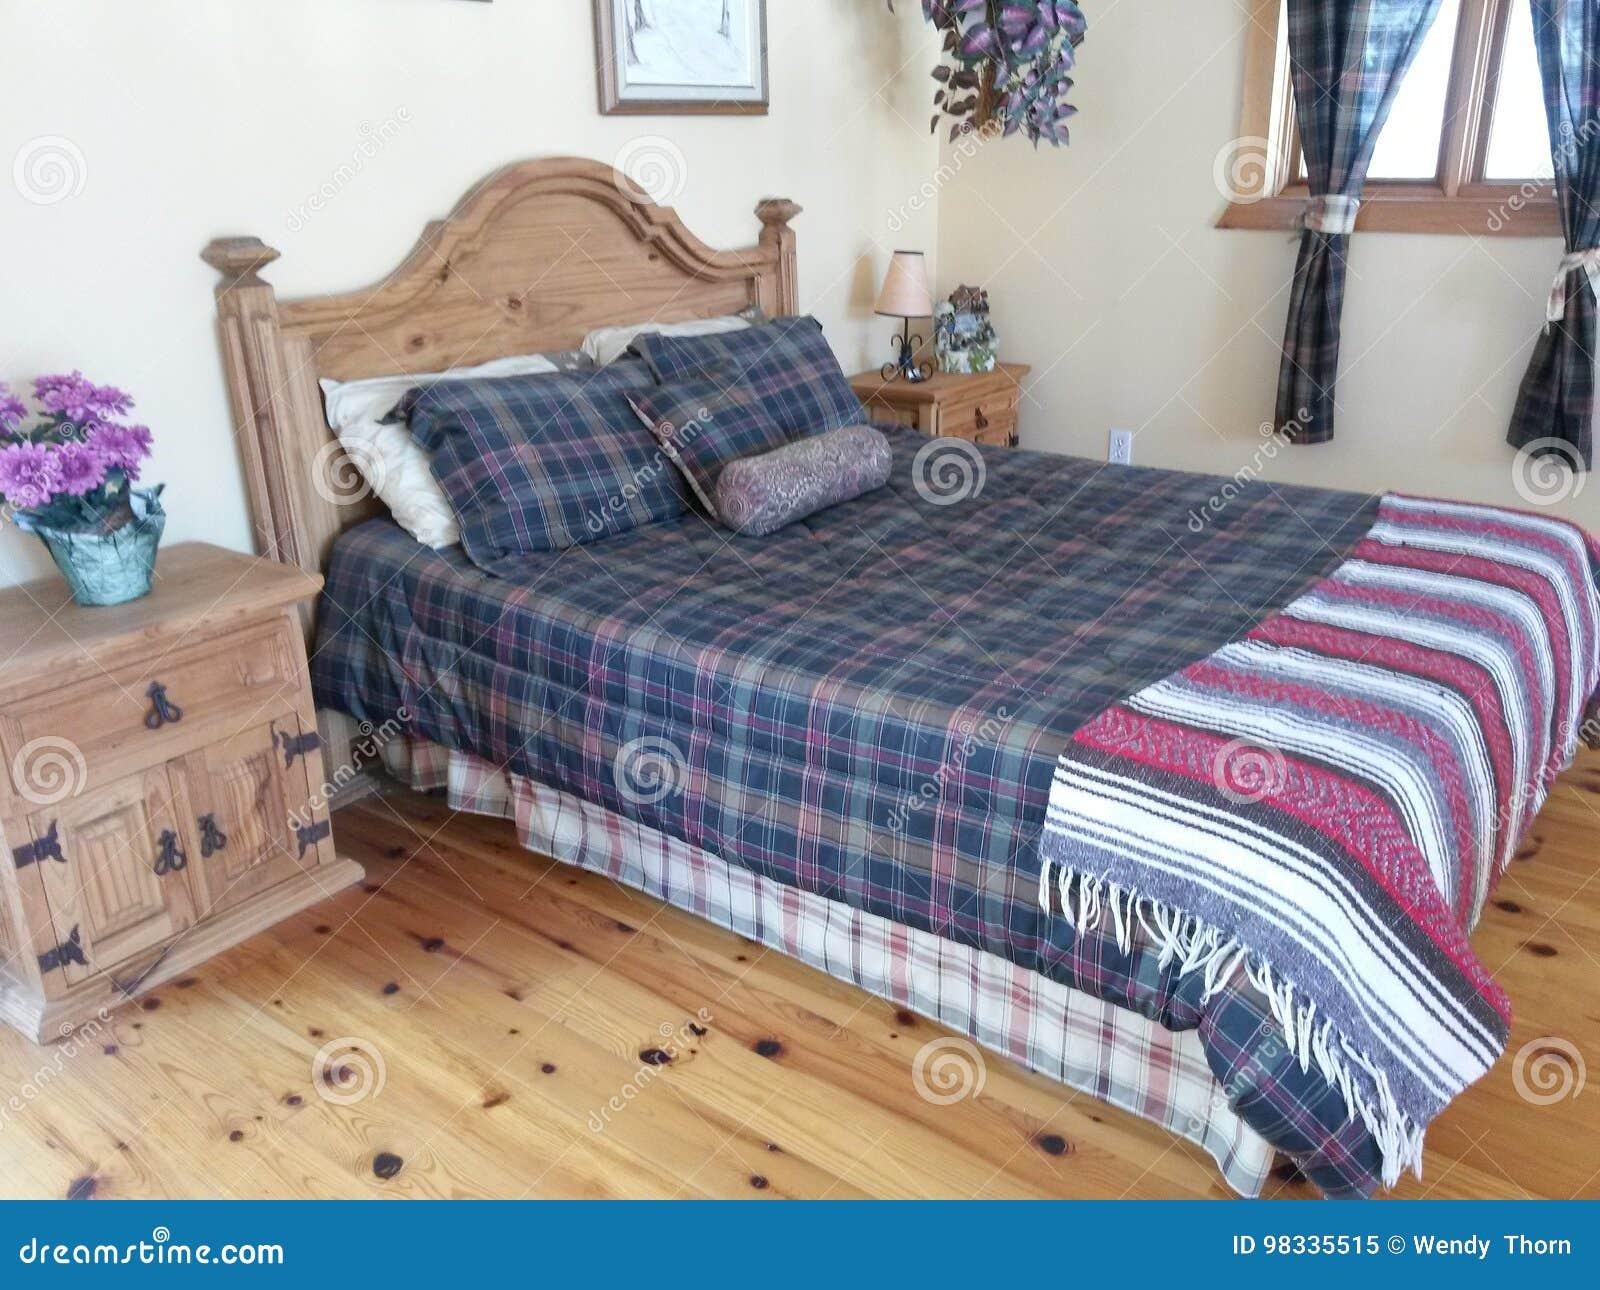 moderne schlafzimmermobel, moderne schlafzimmer-möbel-festes holz-bett-böden stockbild - bild, Design ideen